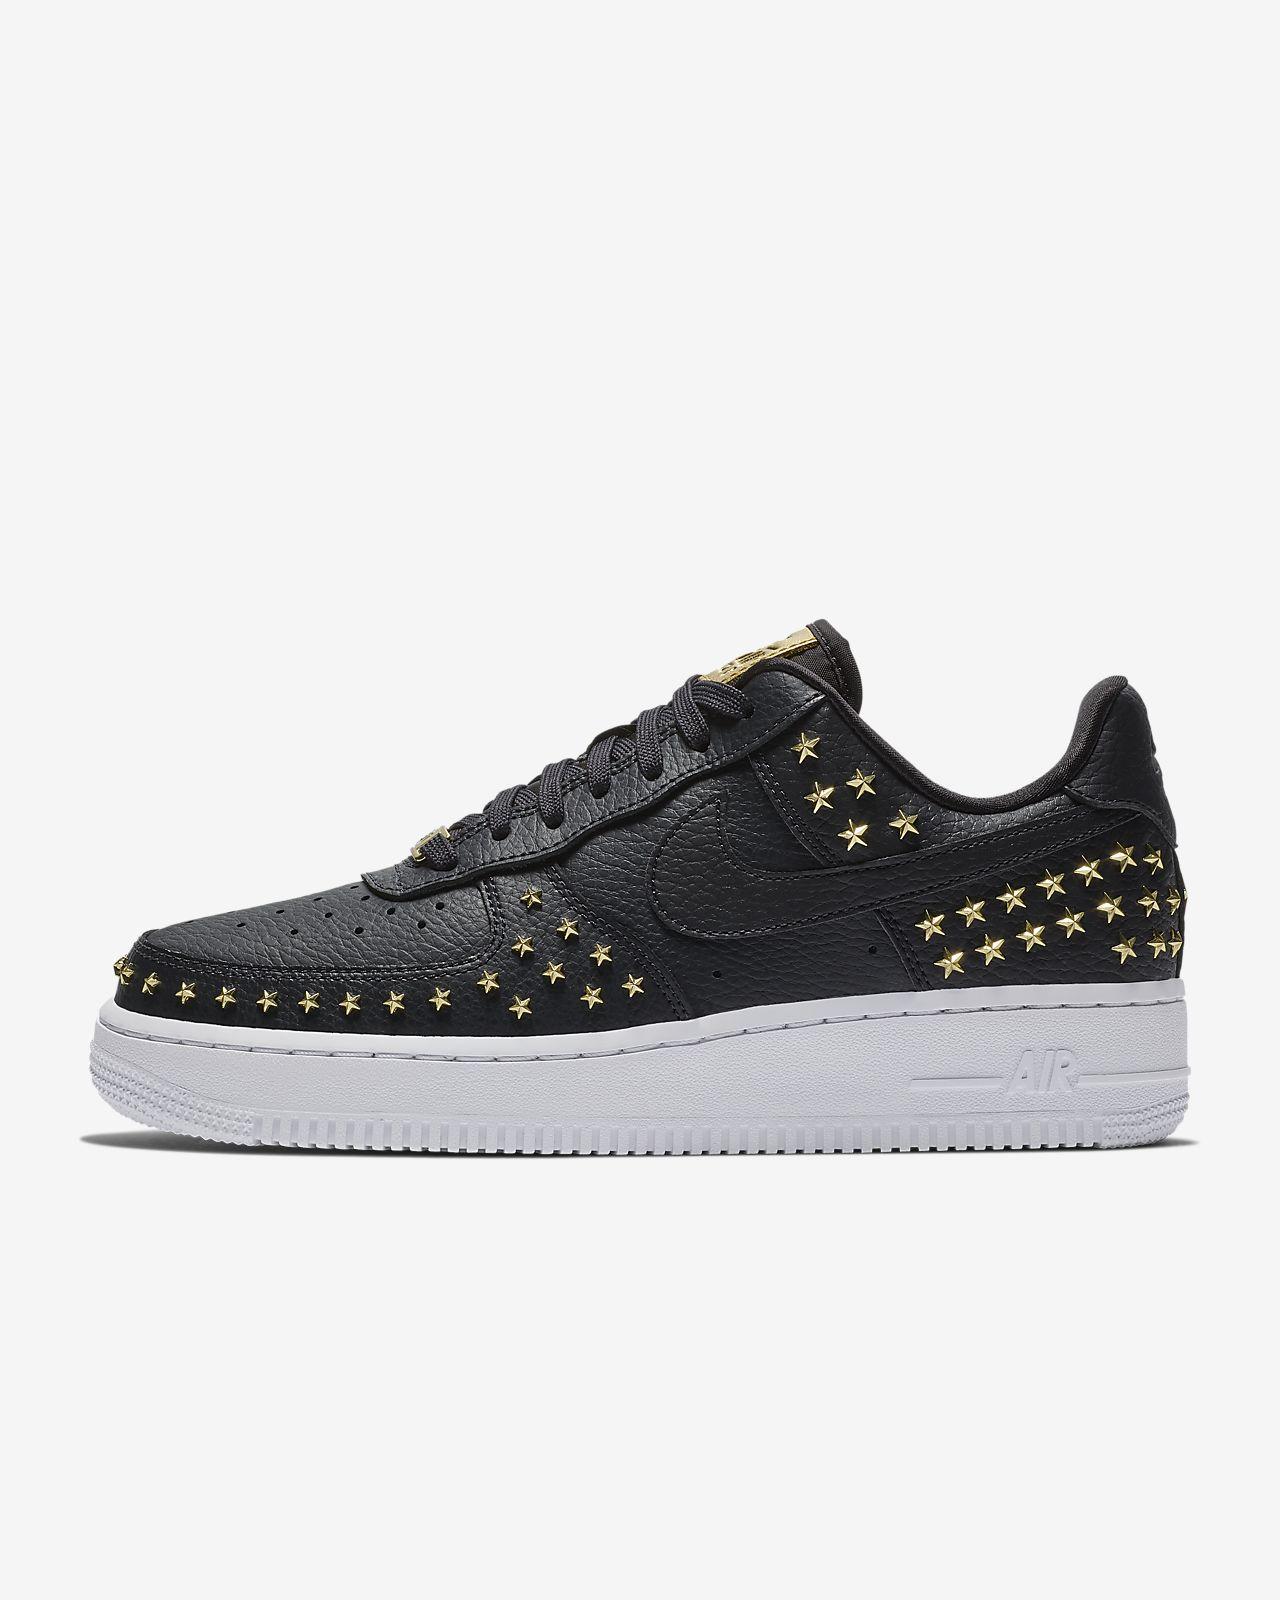 big sale d1cb9 88197 ... Nike Air Force 1 07 XX Studded sko til dame